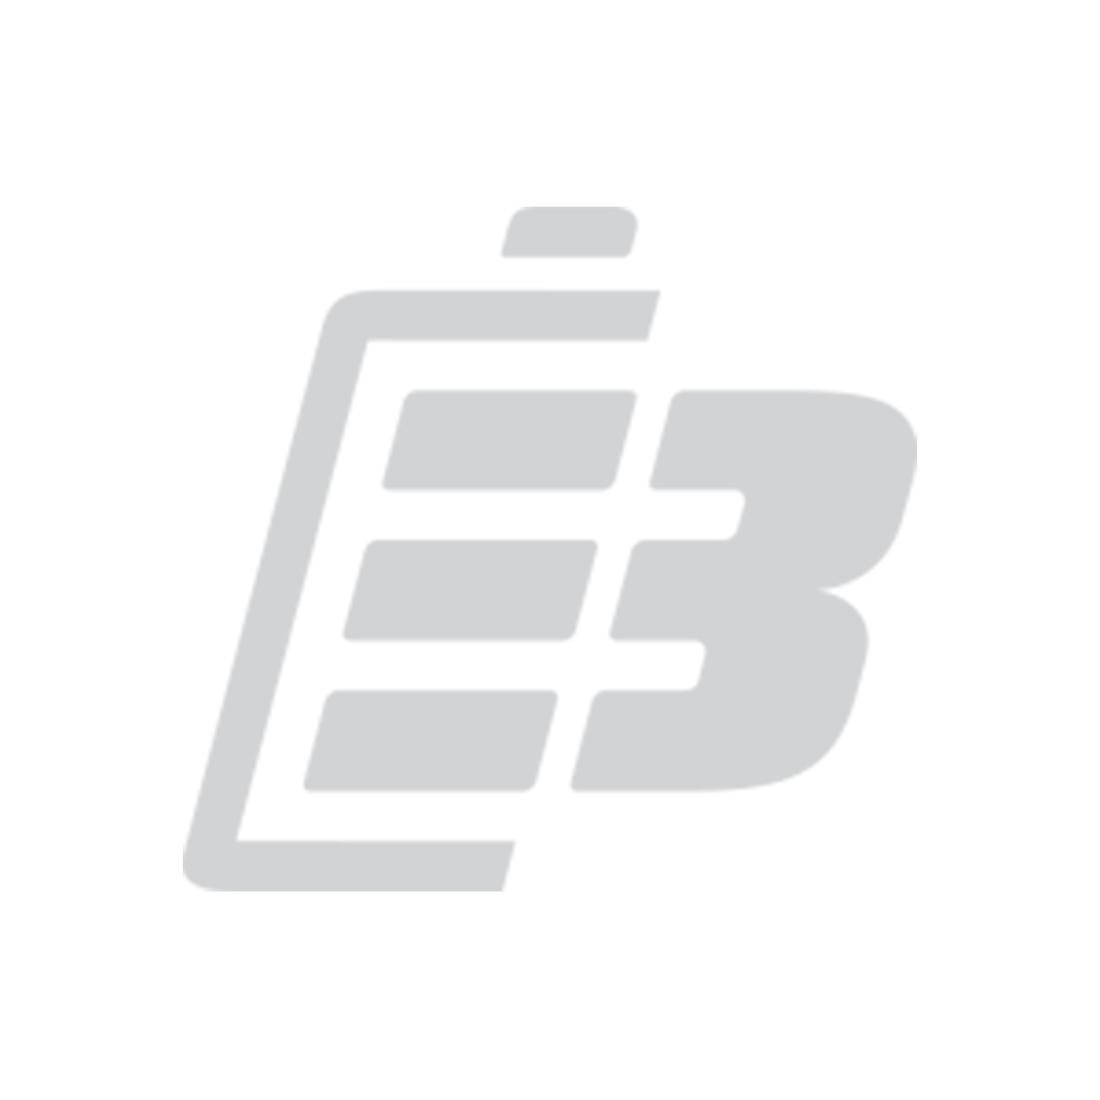 Cordless phone battery Siemens Gigaset 2000_1